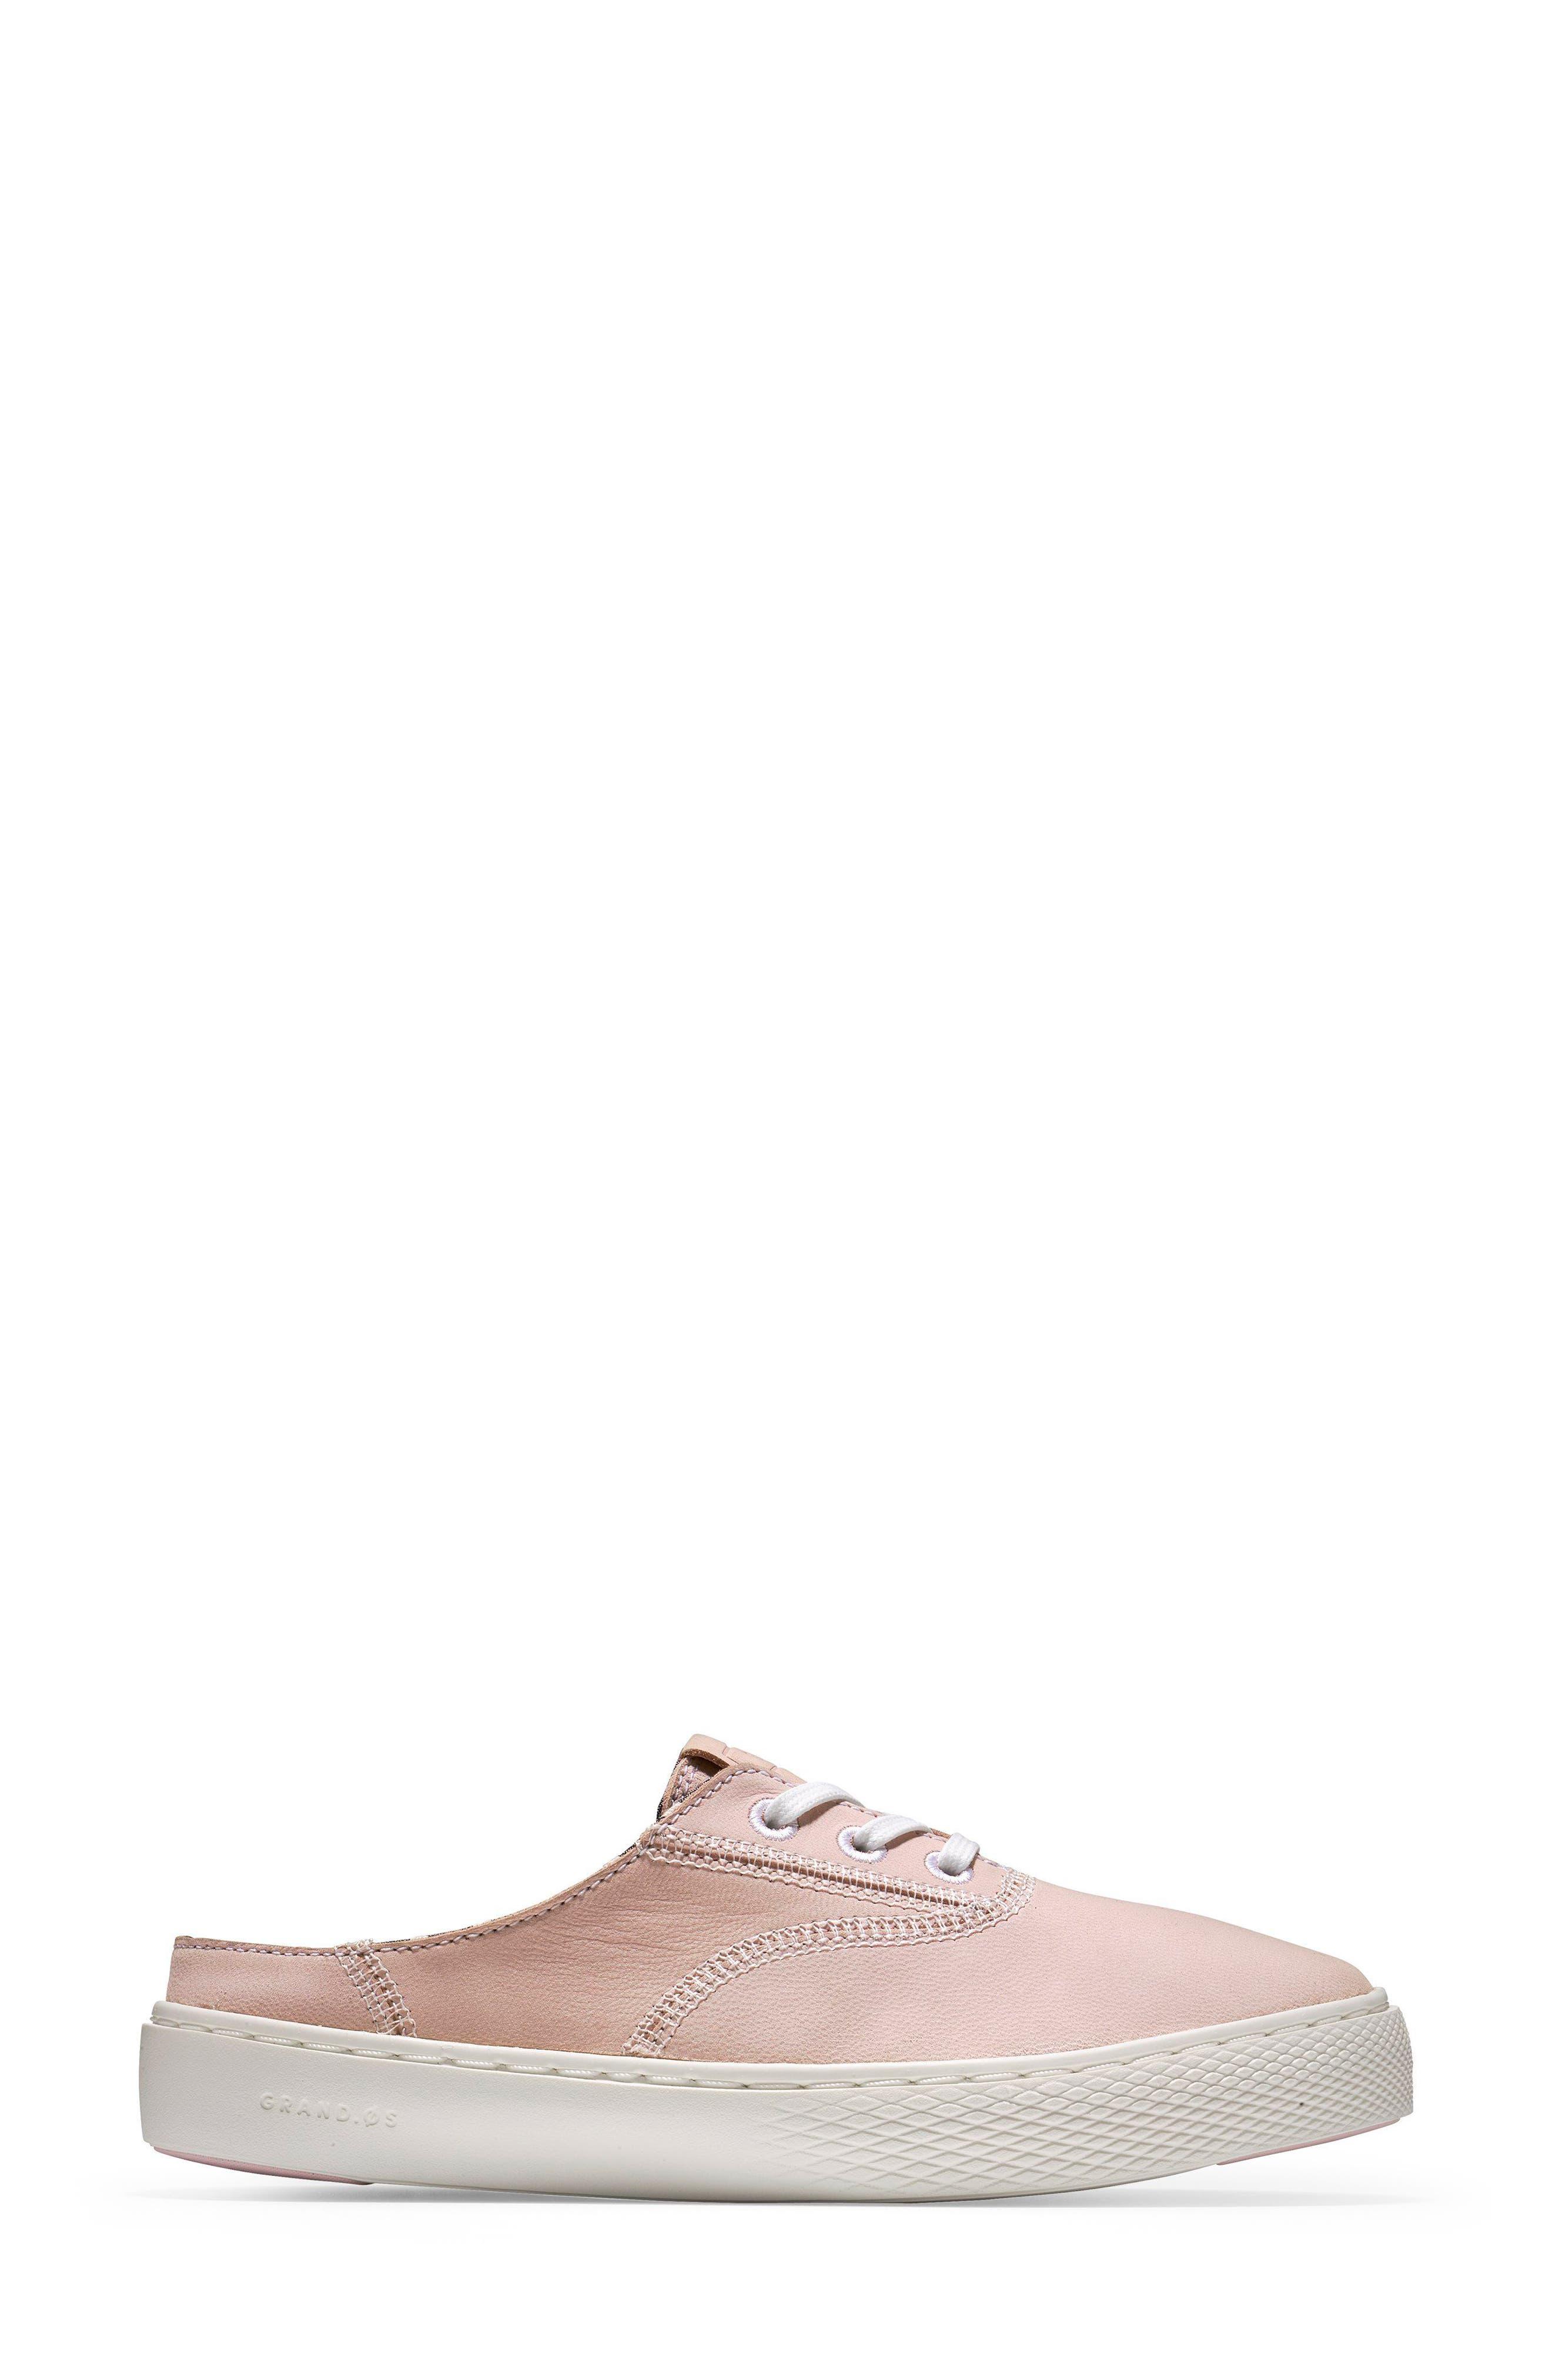 GrandPro Deck Sneaker,                             Alternate thumbnail 3, color,                             PETAL/ OPTIC WHITE NUBUCK